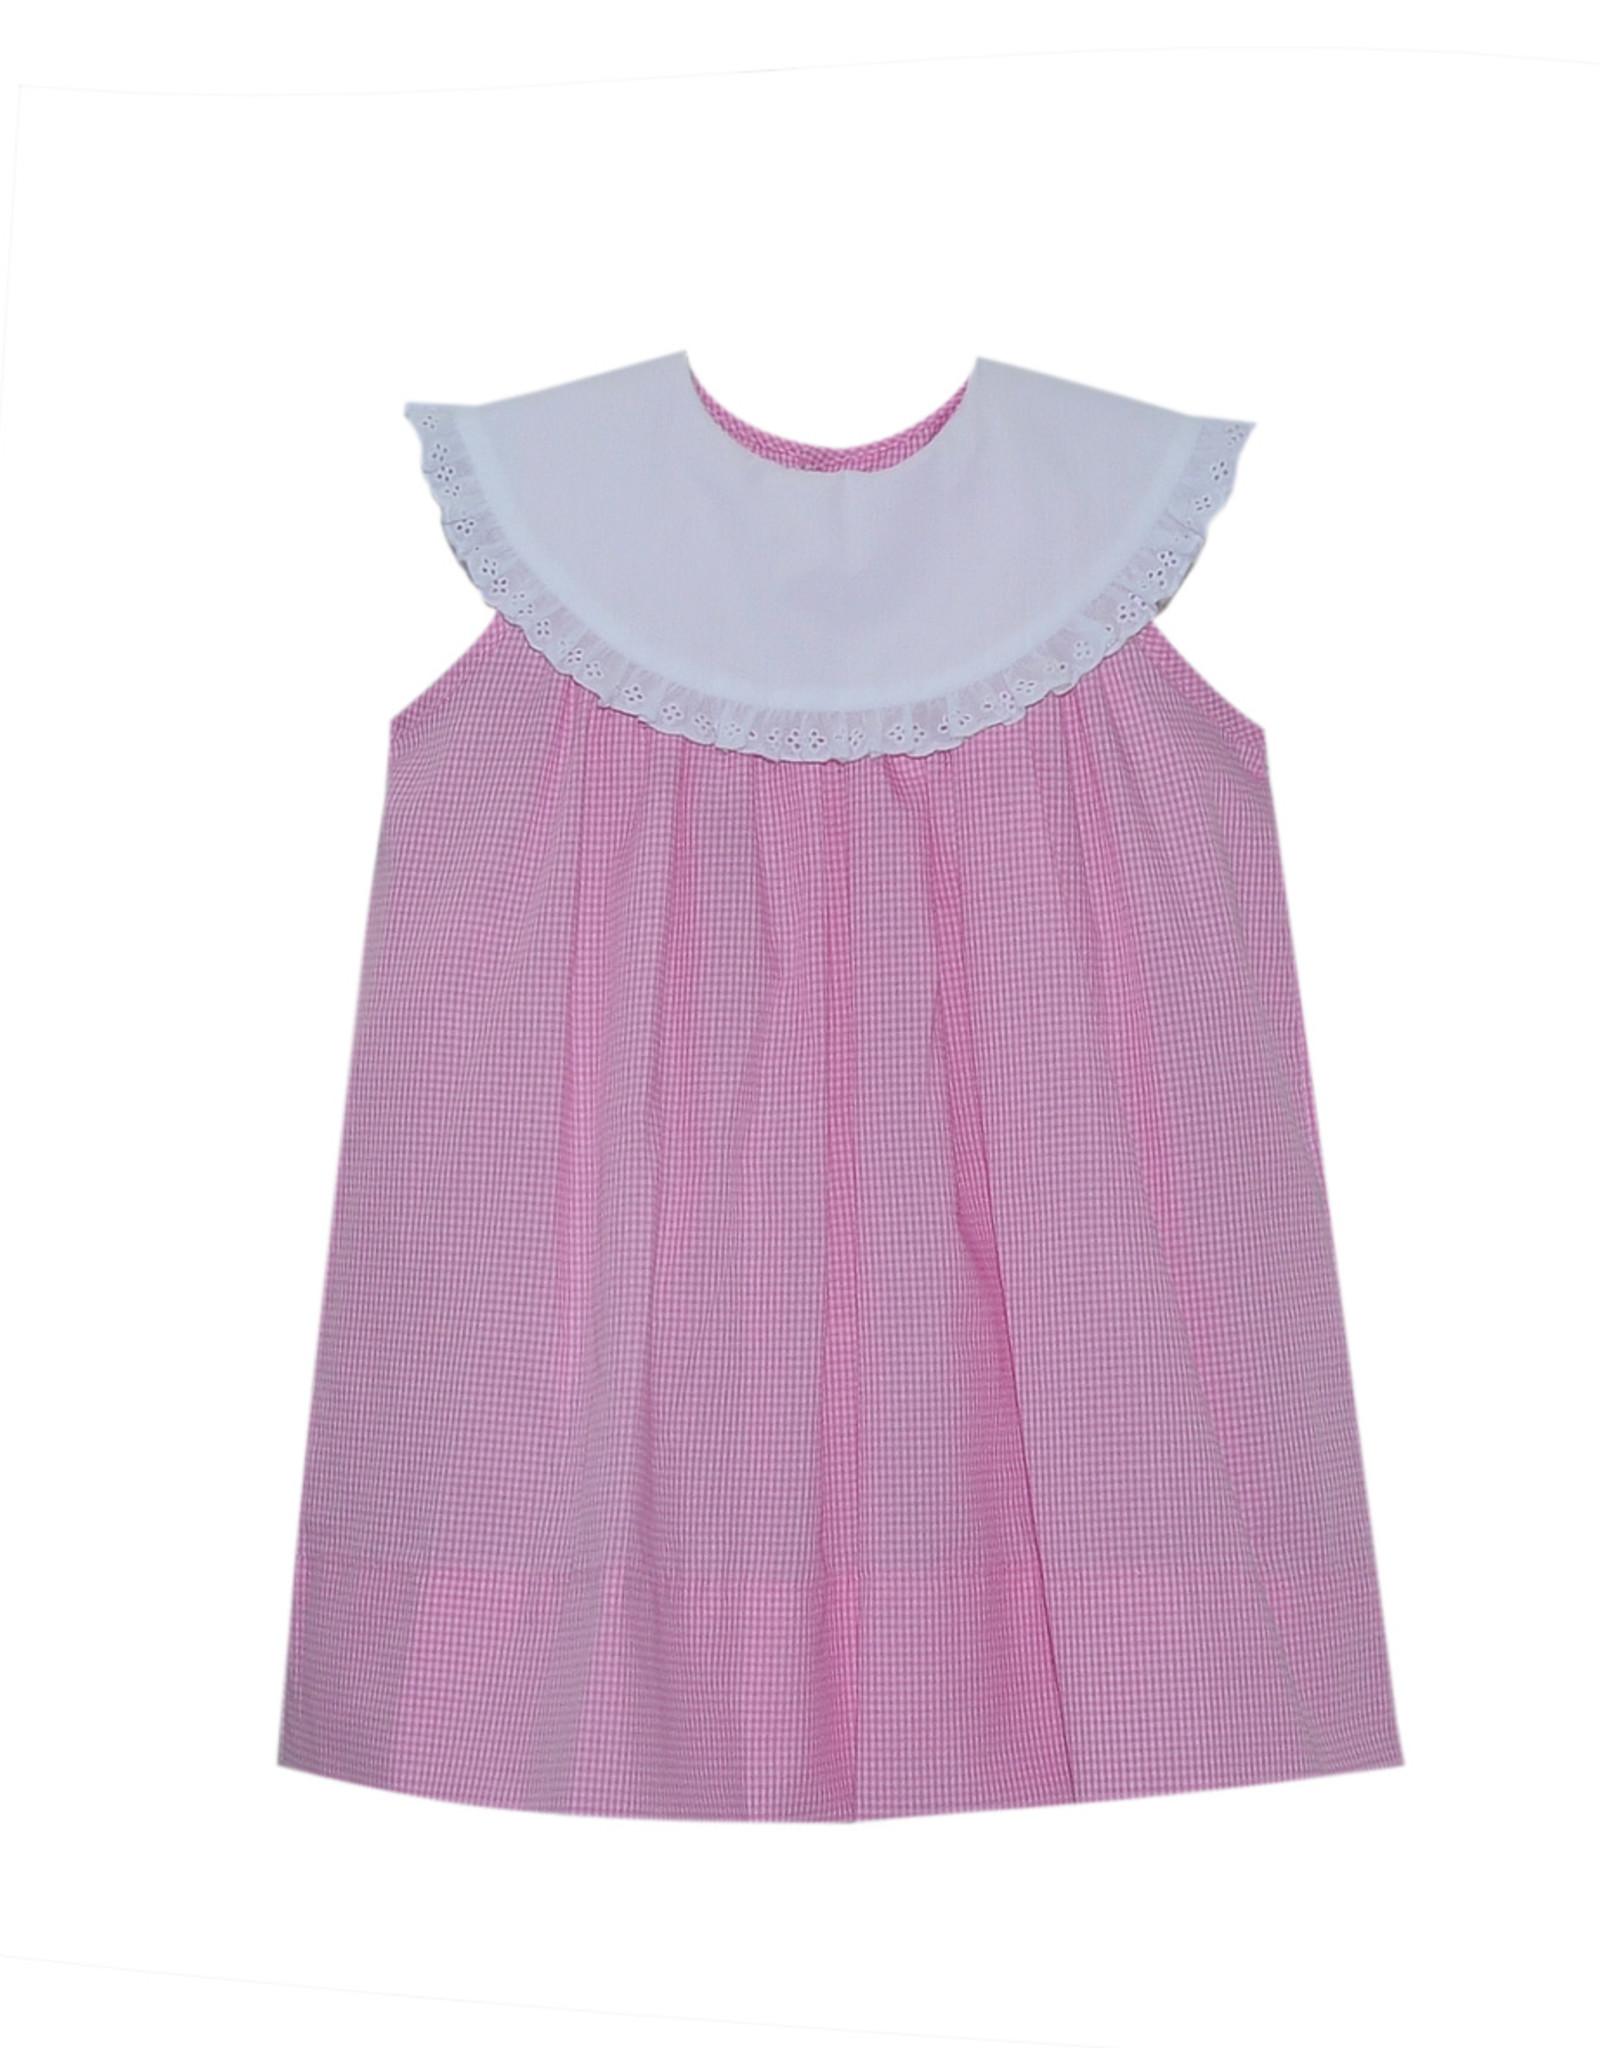 LullabySet Olivia Pink Dress With White Collar